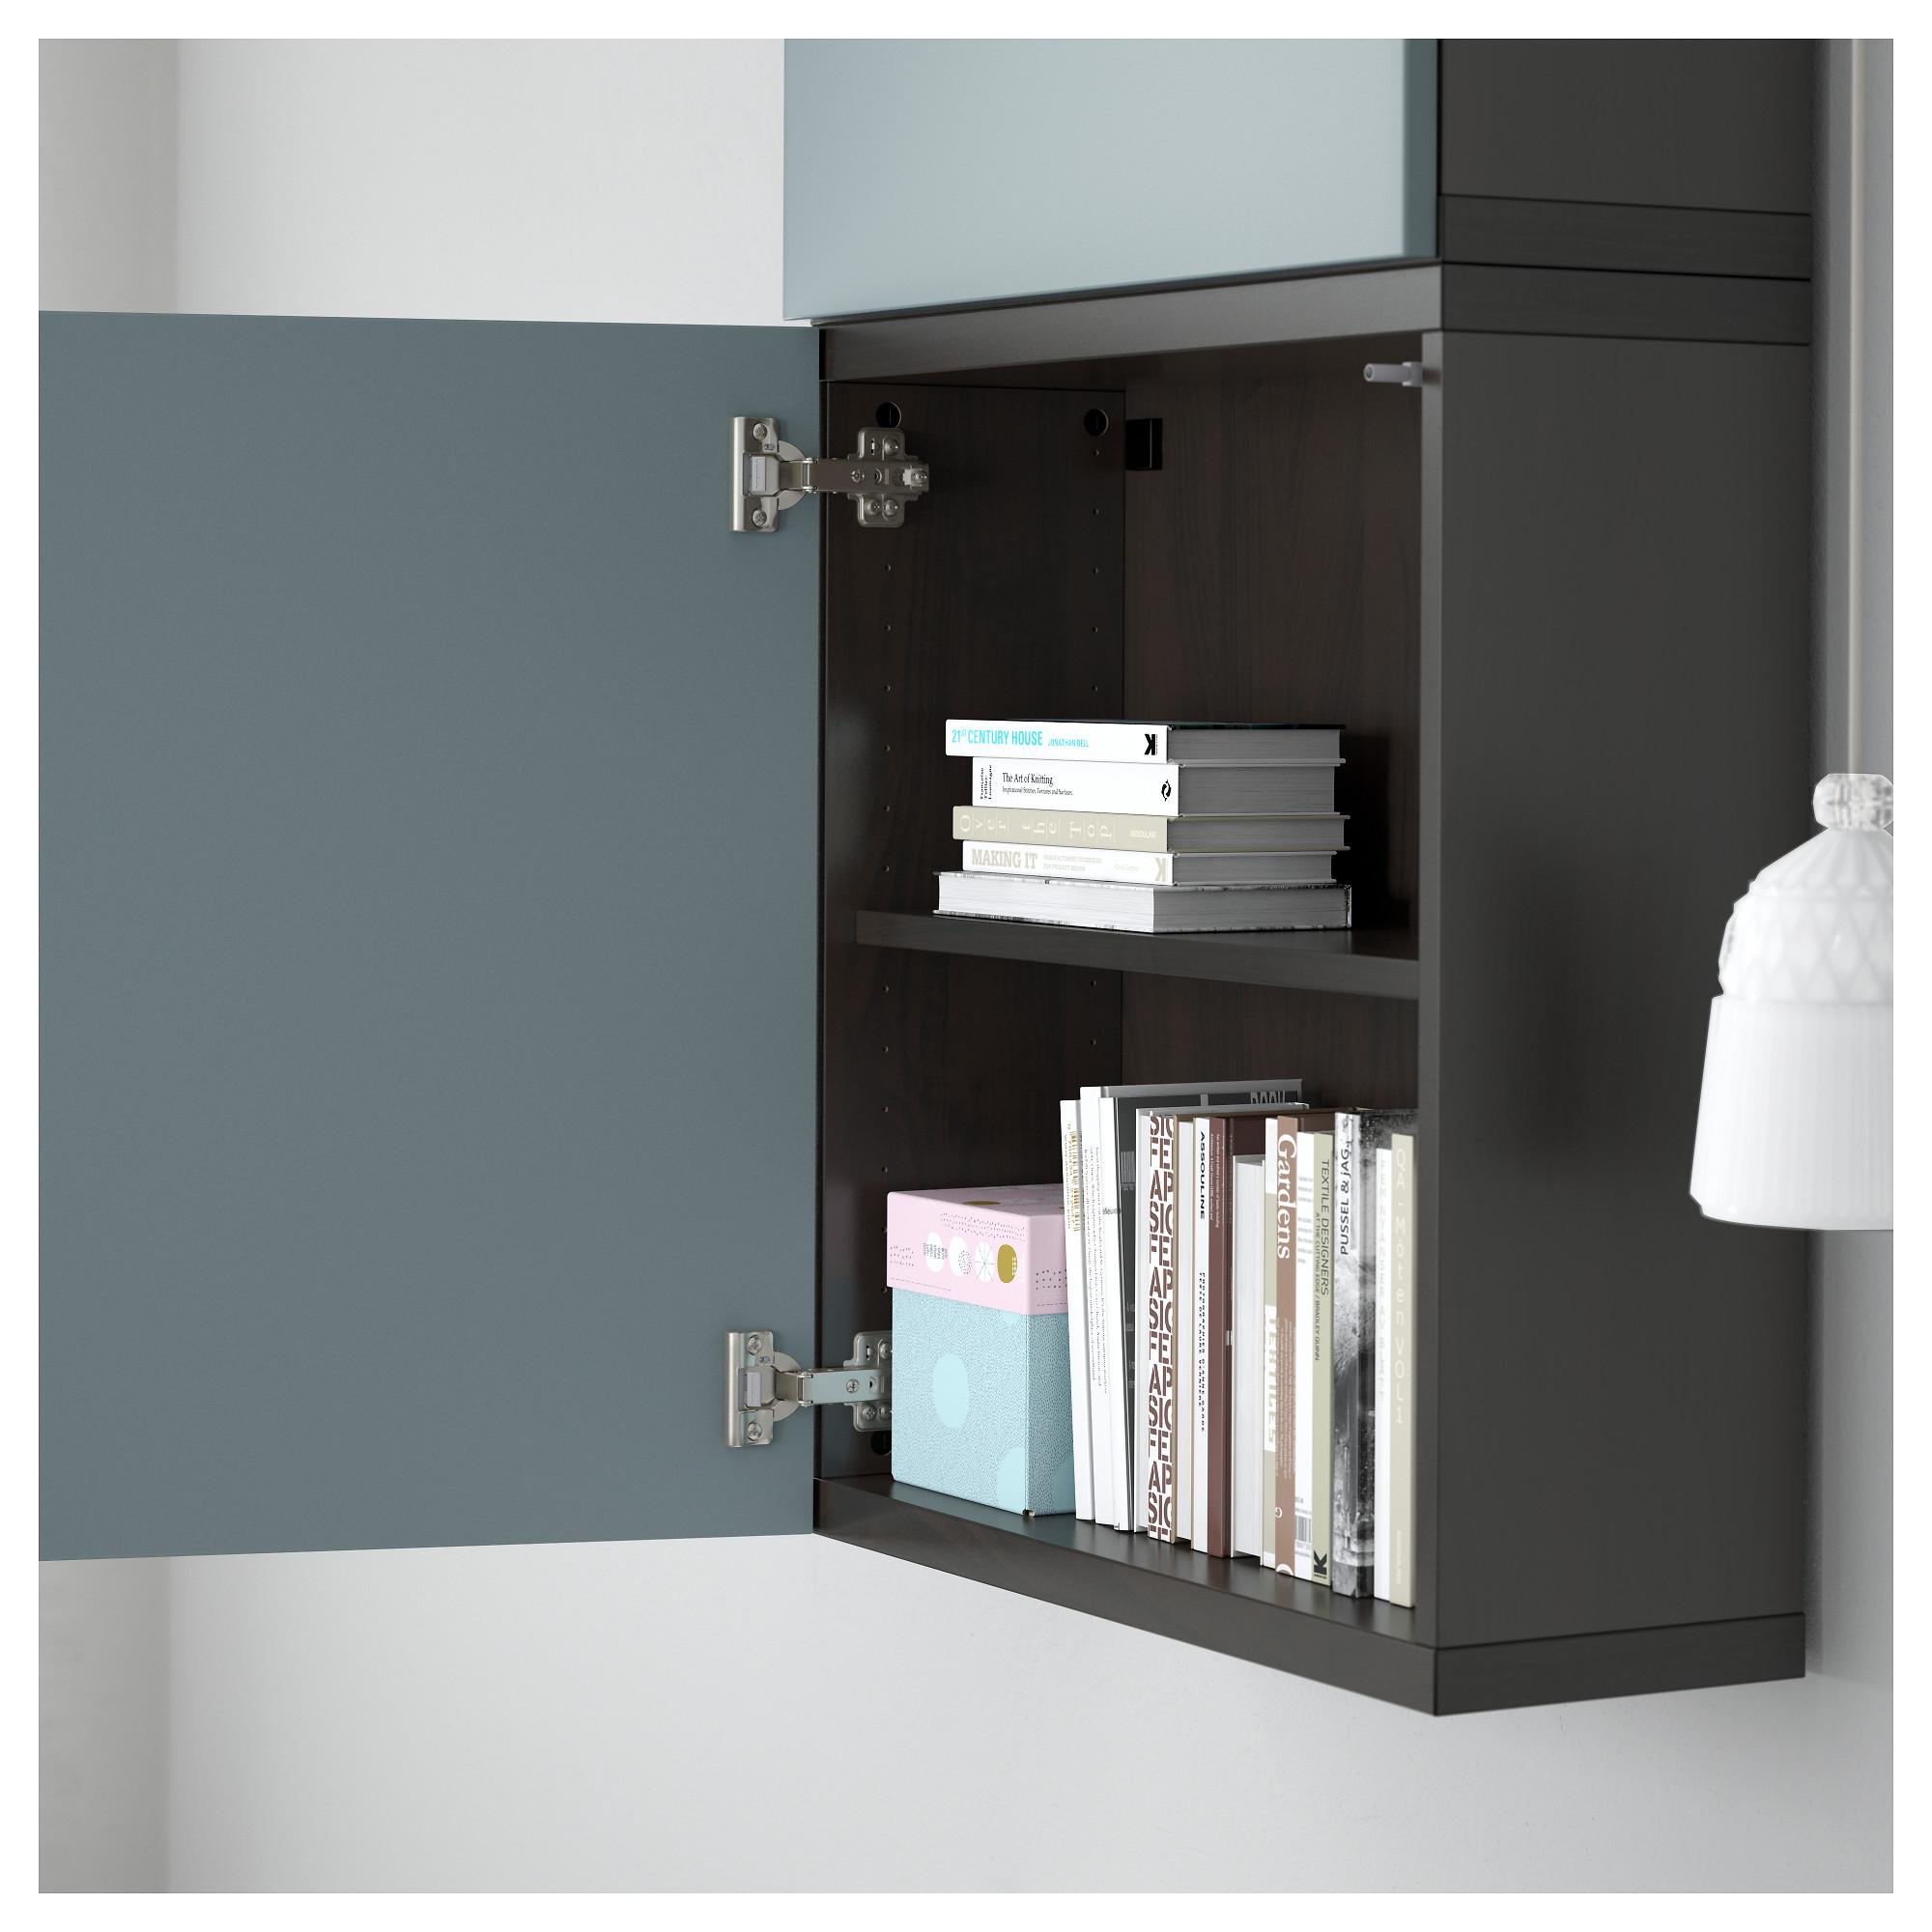 Навесной шкаф с 2 дверями БЕСТО артикуль № 692.482.68 в наличии. Онлайн сайт IKEA РБ. Недорогая доставка и соборка.